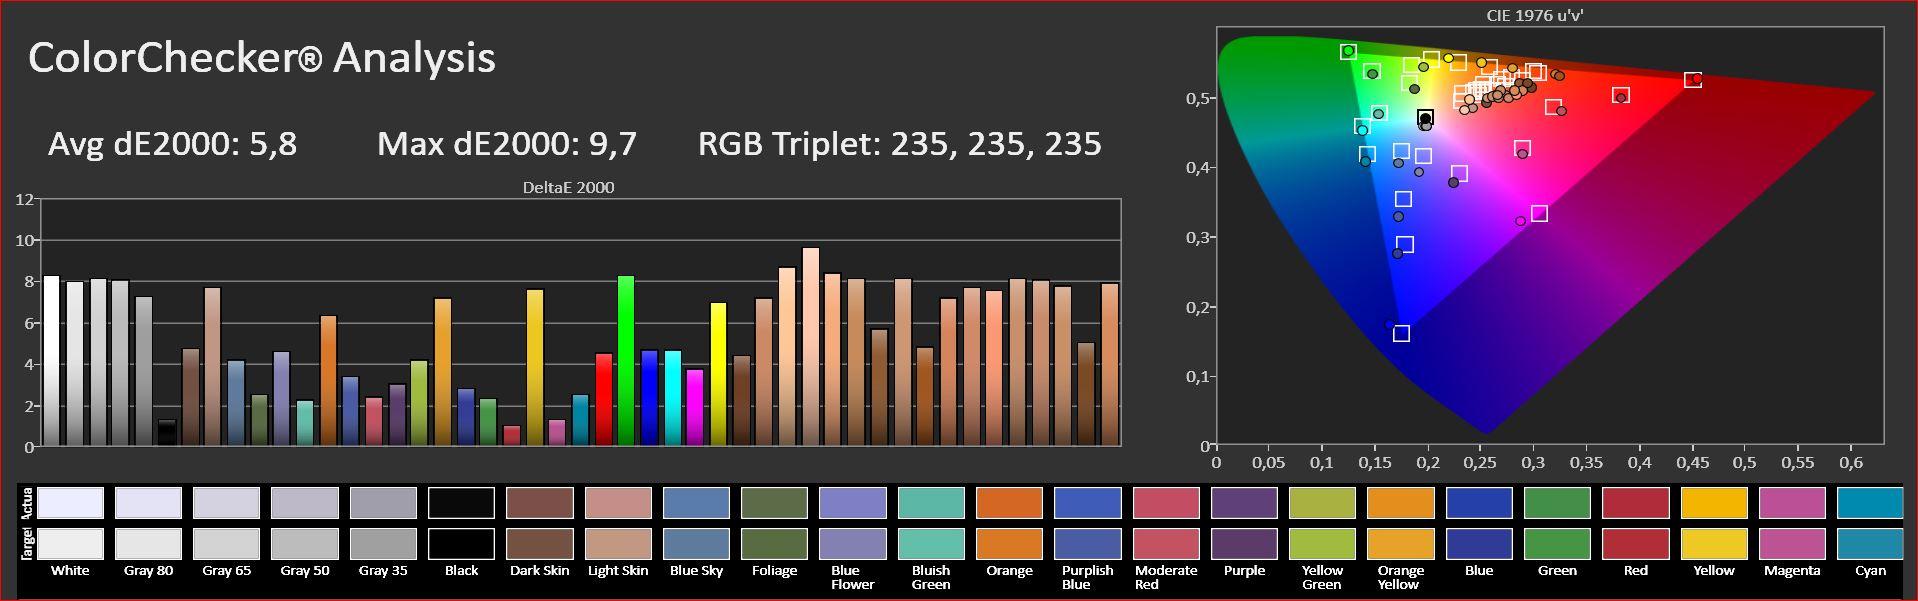 De kleurresultaten van de Optoma HD27e